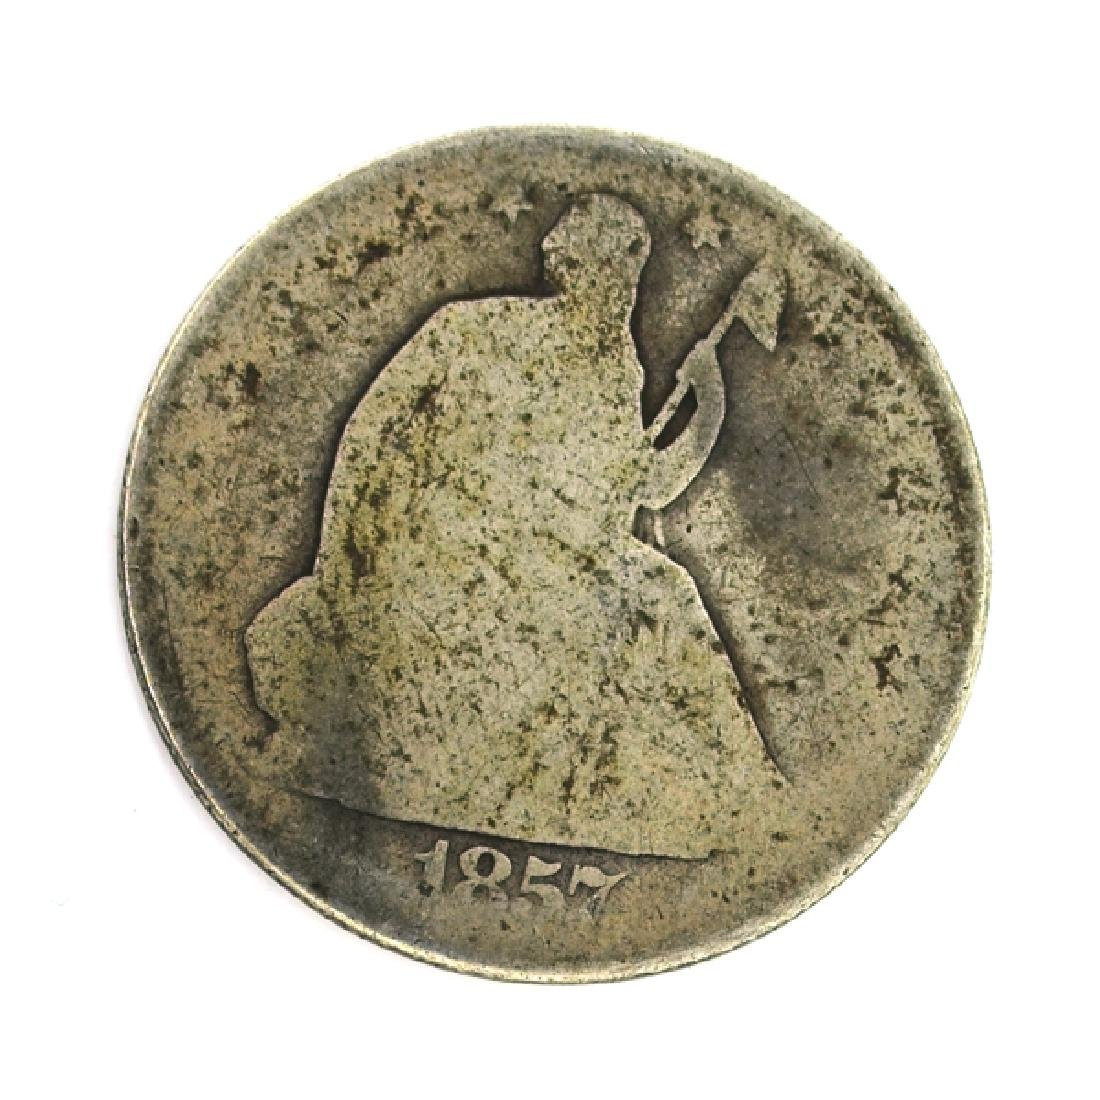 1857-O Liberty Seated Half Dollar Coin